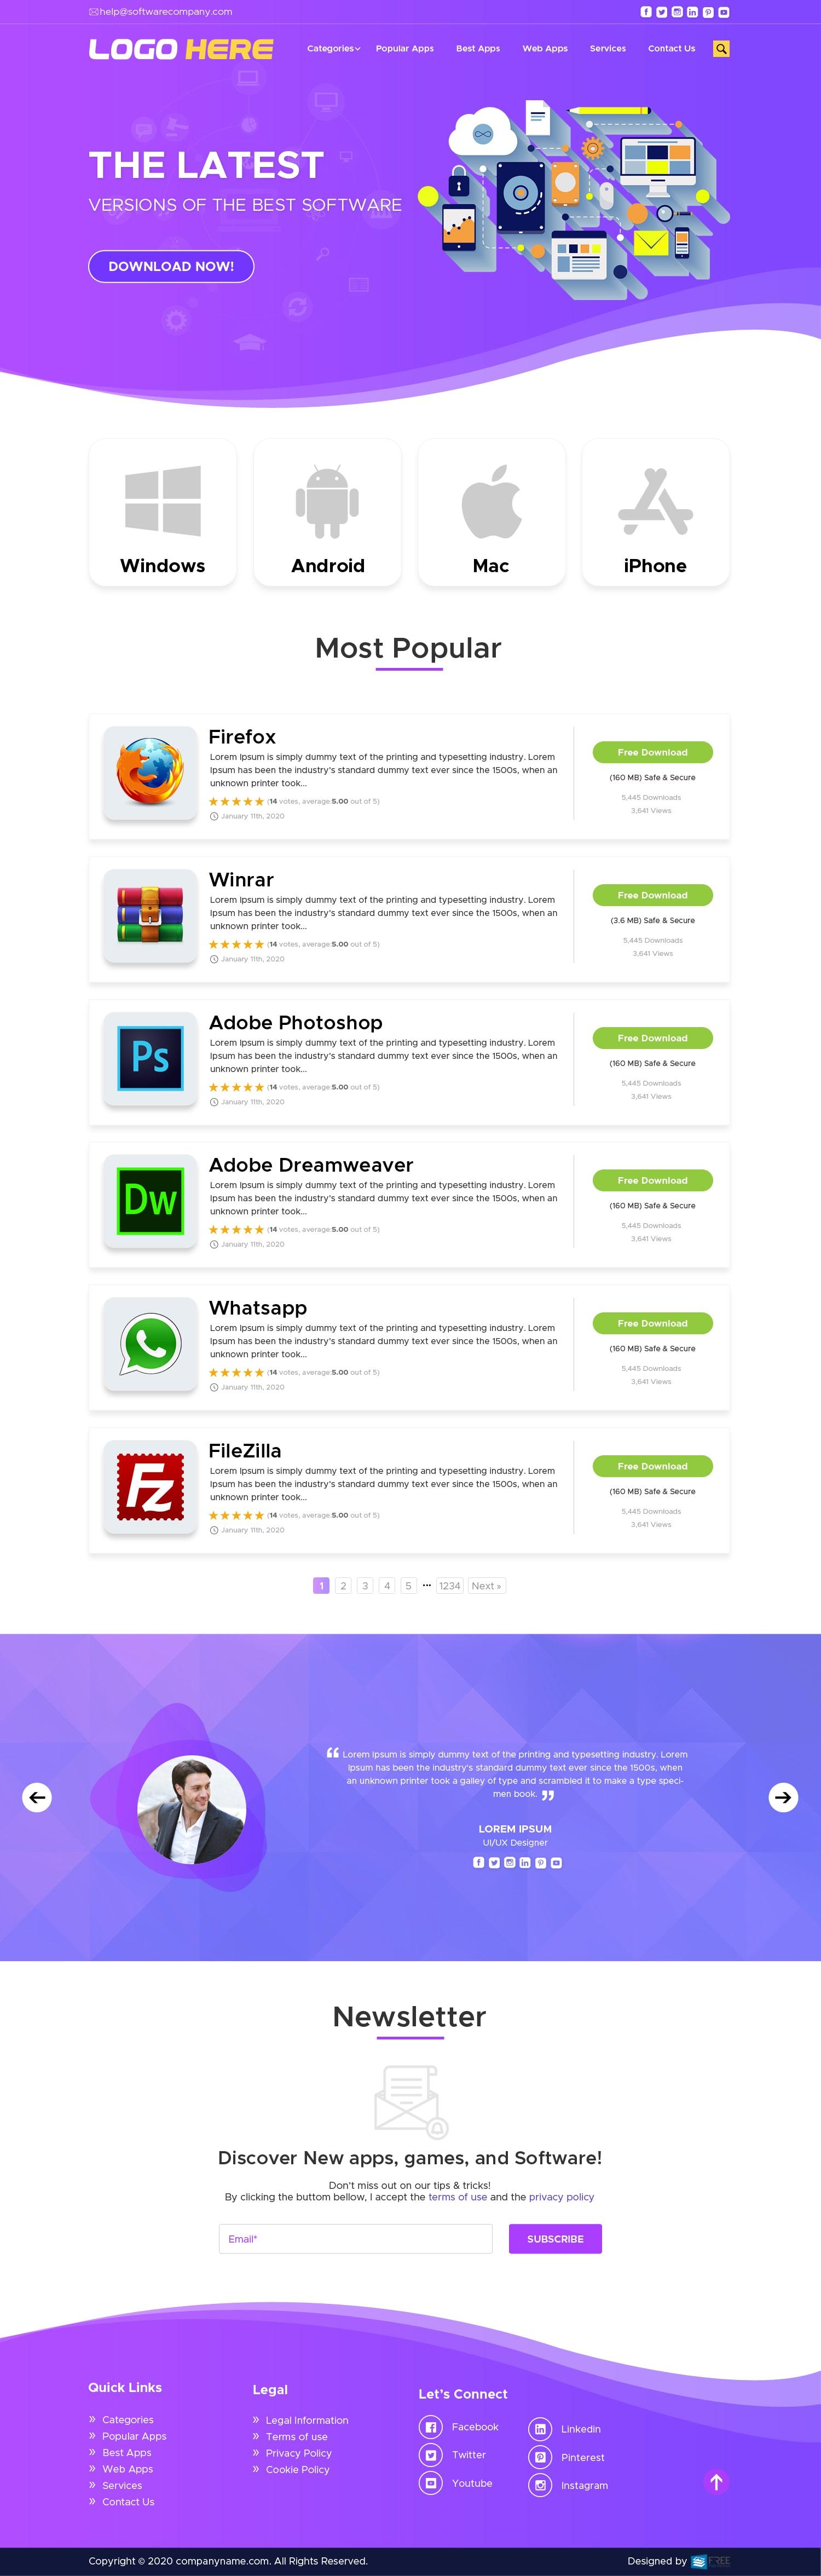 Free Software download website Landing Page